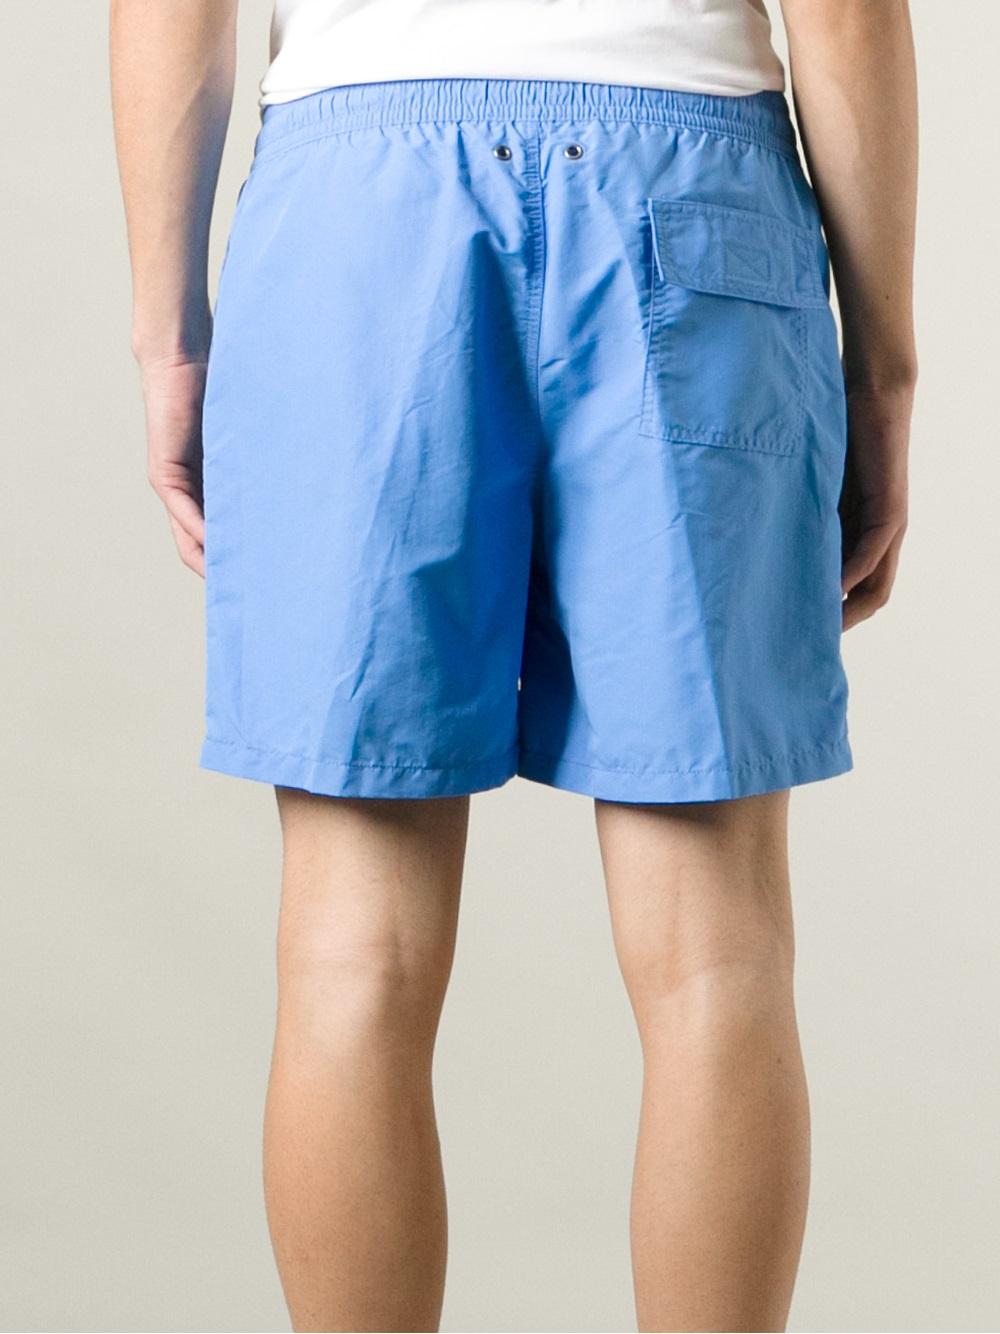 c0ea68a58a Polo Ralph Lauren Hawaiian Swim Shorts in Blue for Men - Lyst